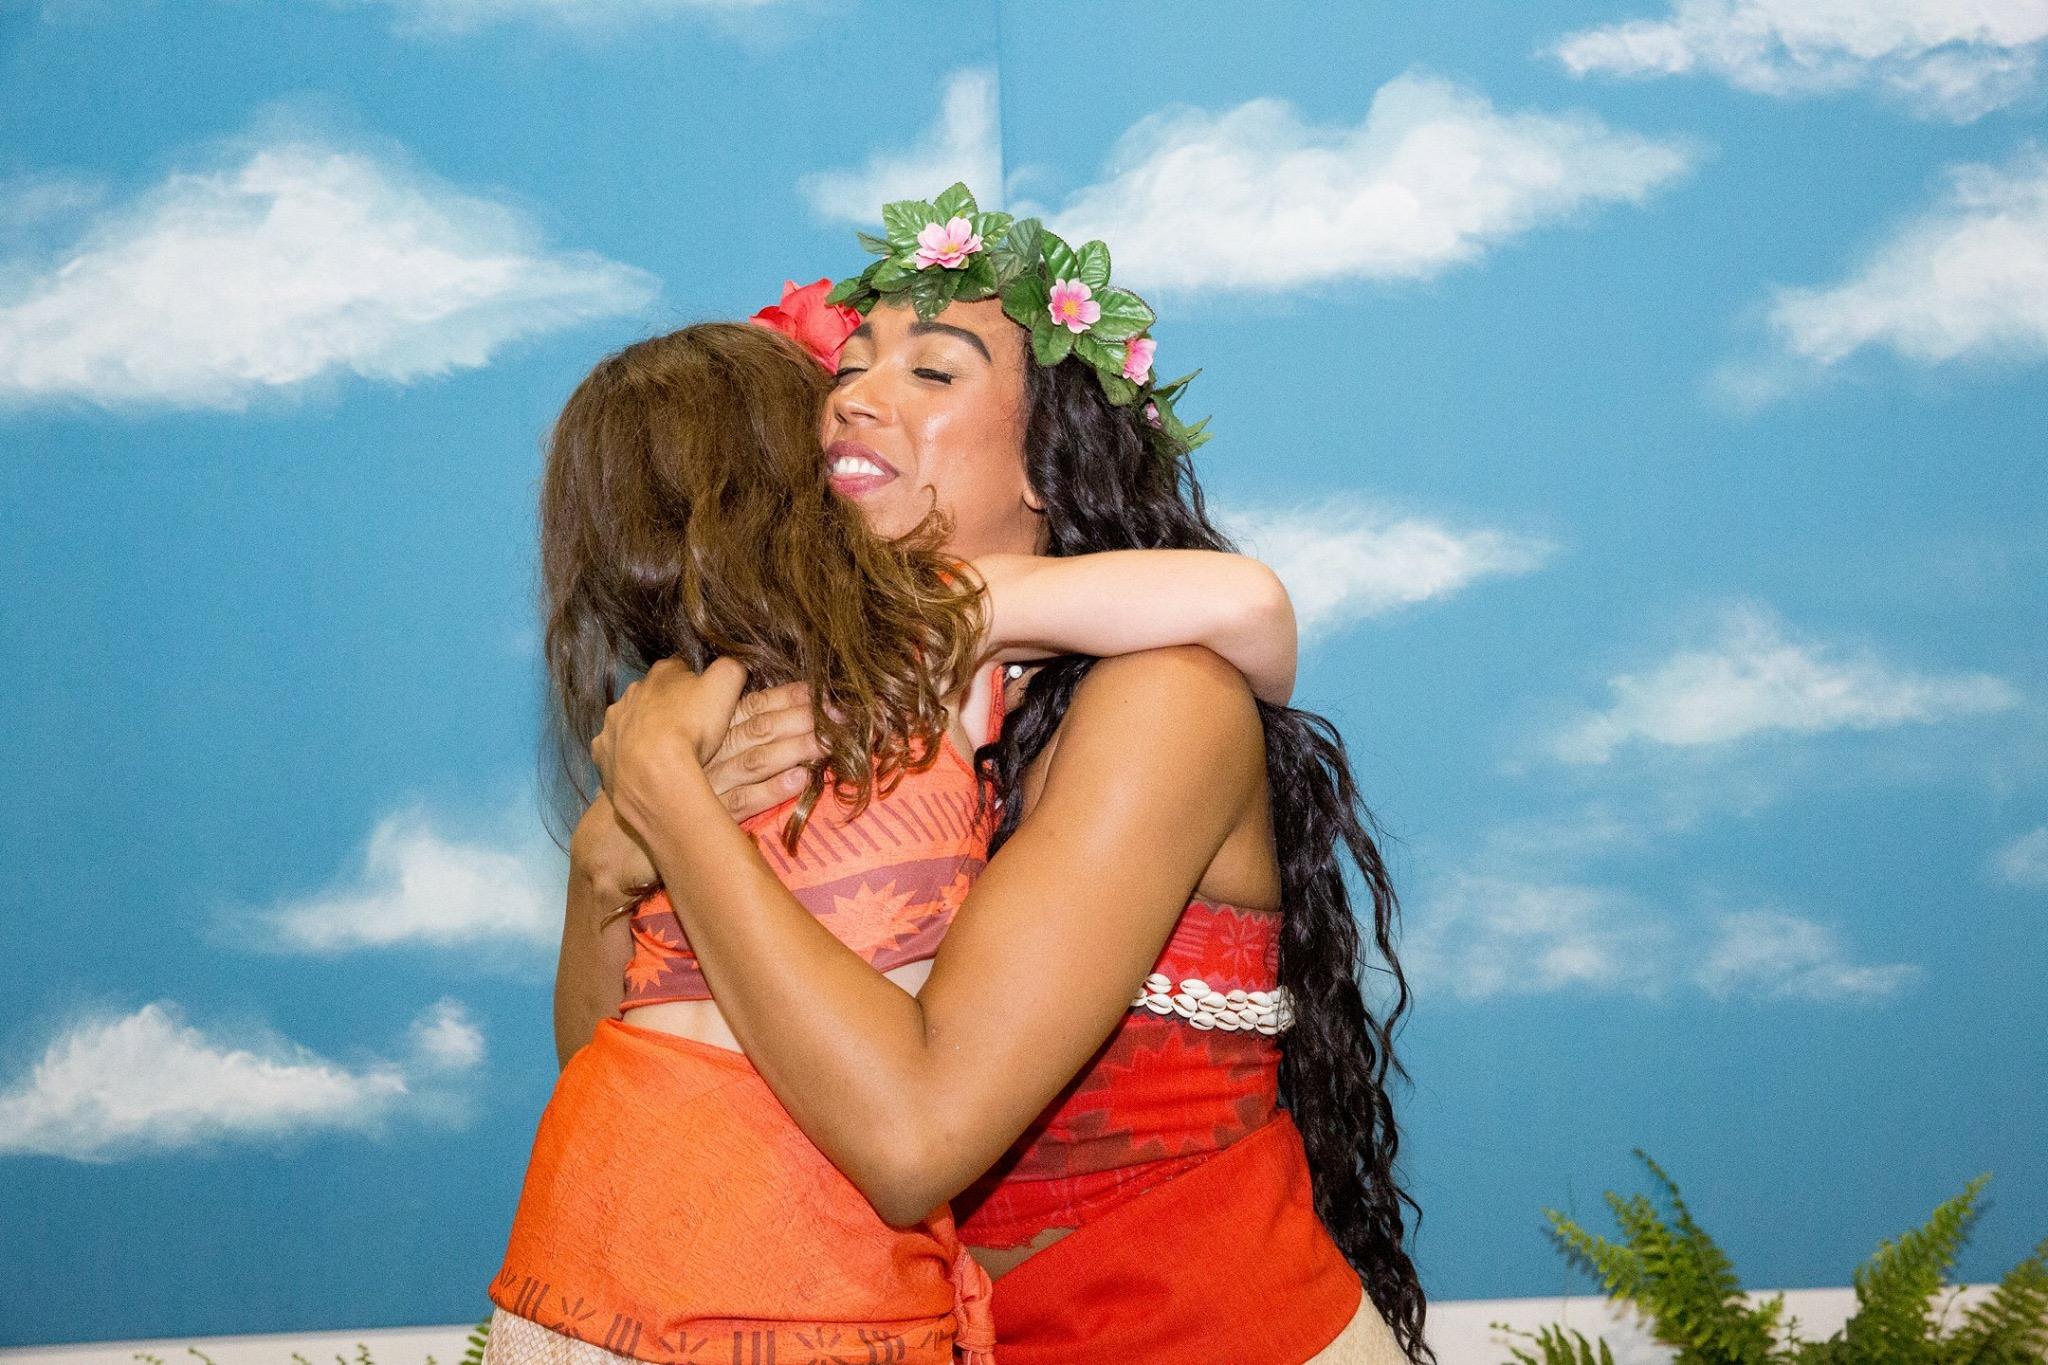 White Rock Princess Party, gemini Visuals Photography, White Rock Photographer, Contest